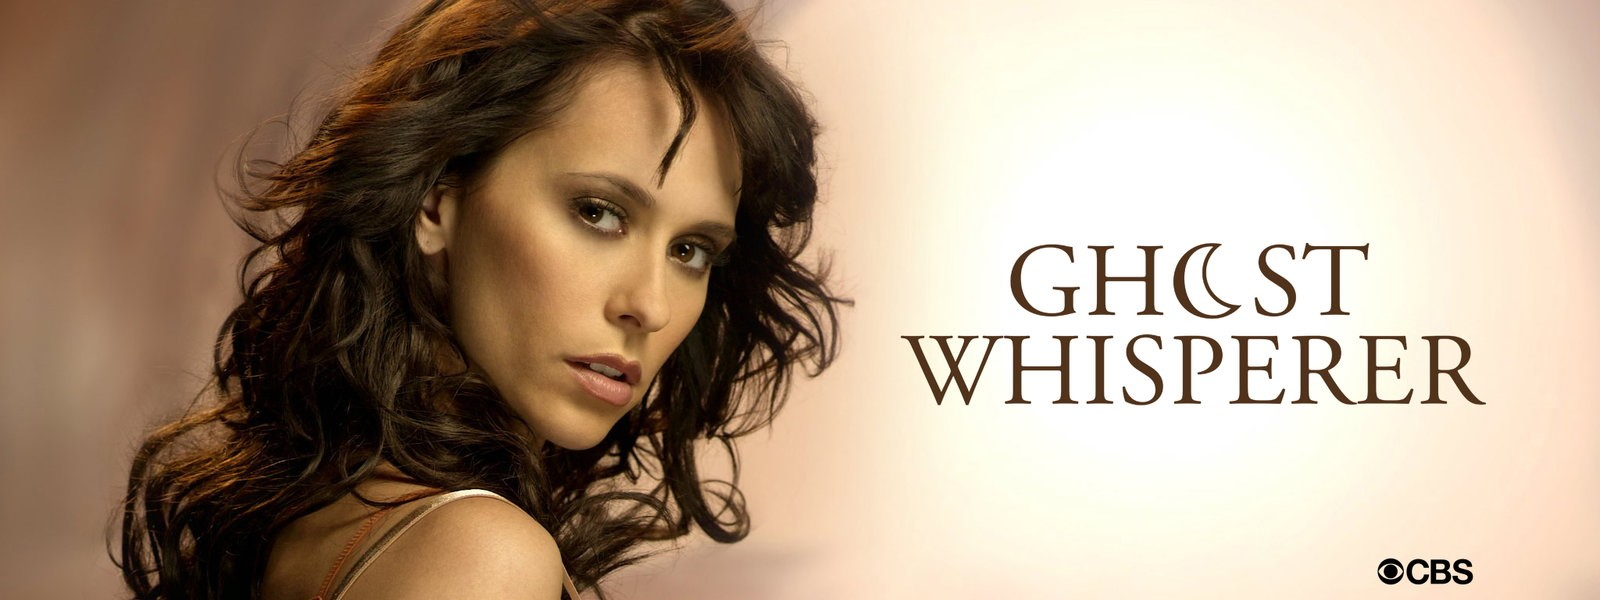 Ghost Whisp